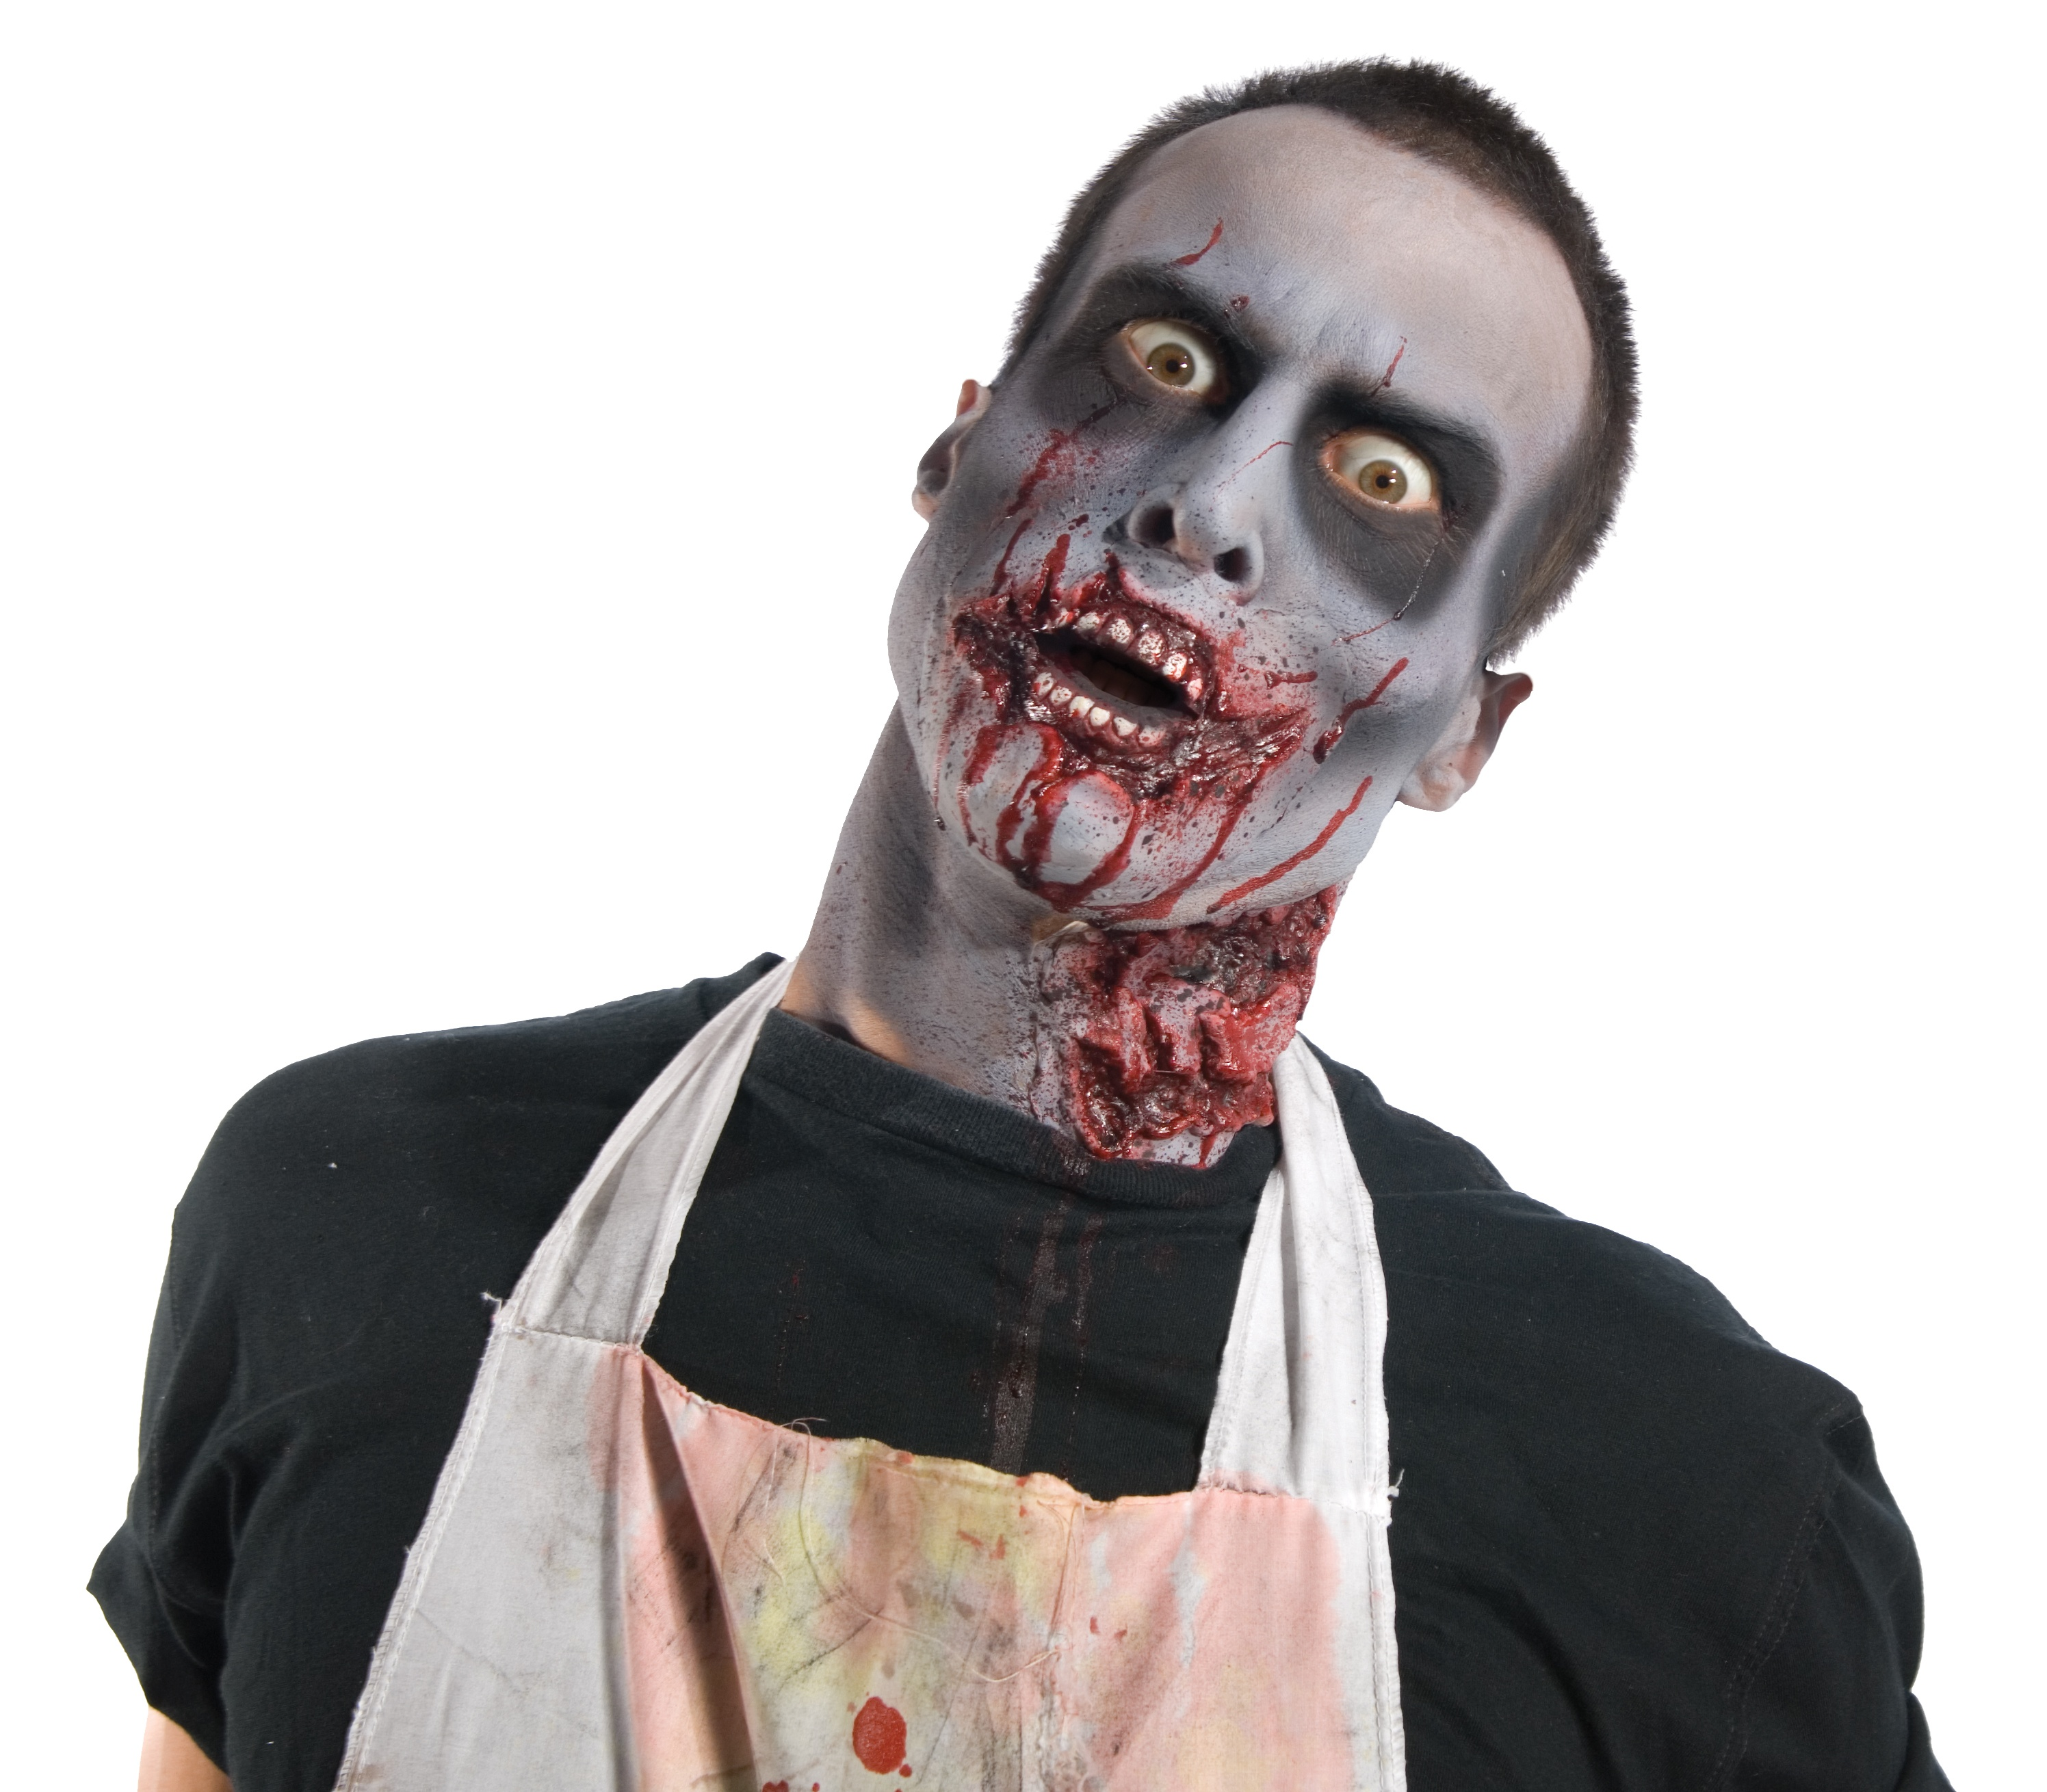 Full Zombie Makeup Kit - Mr. Costumes